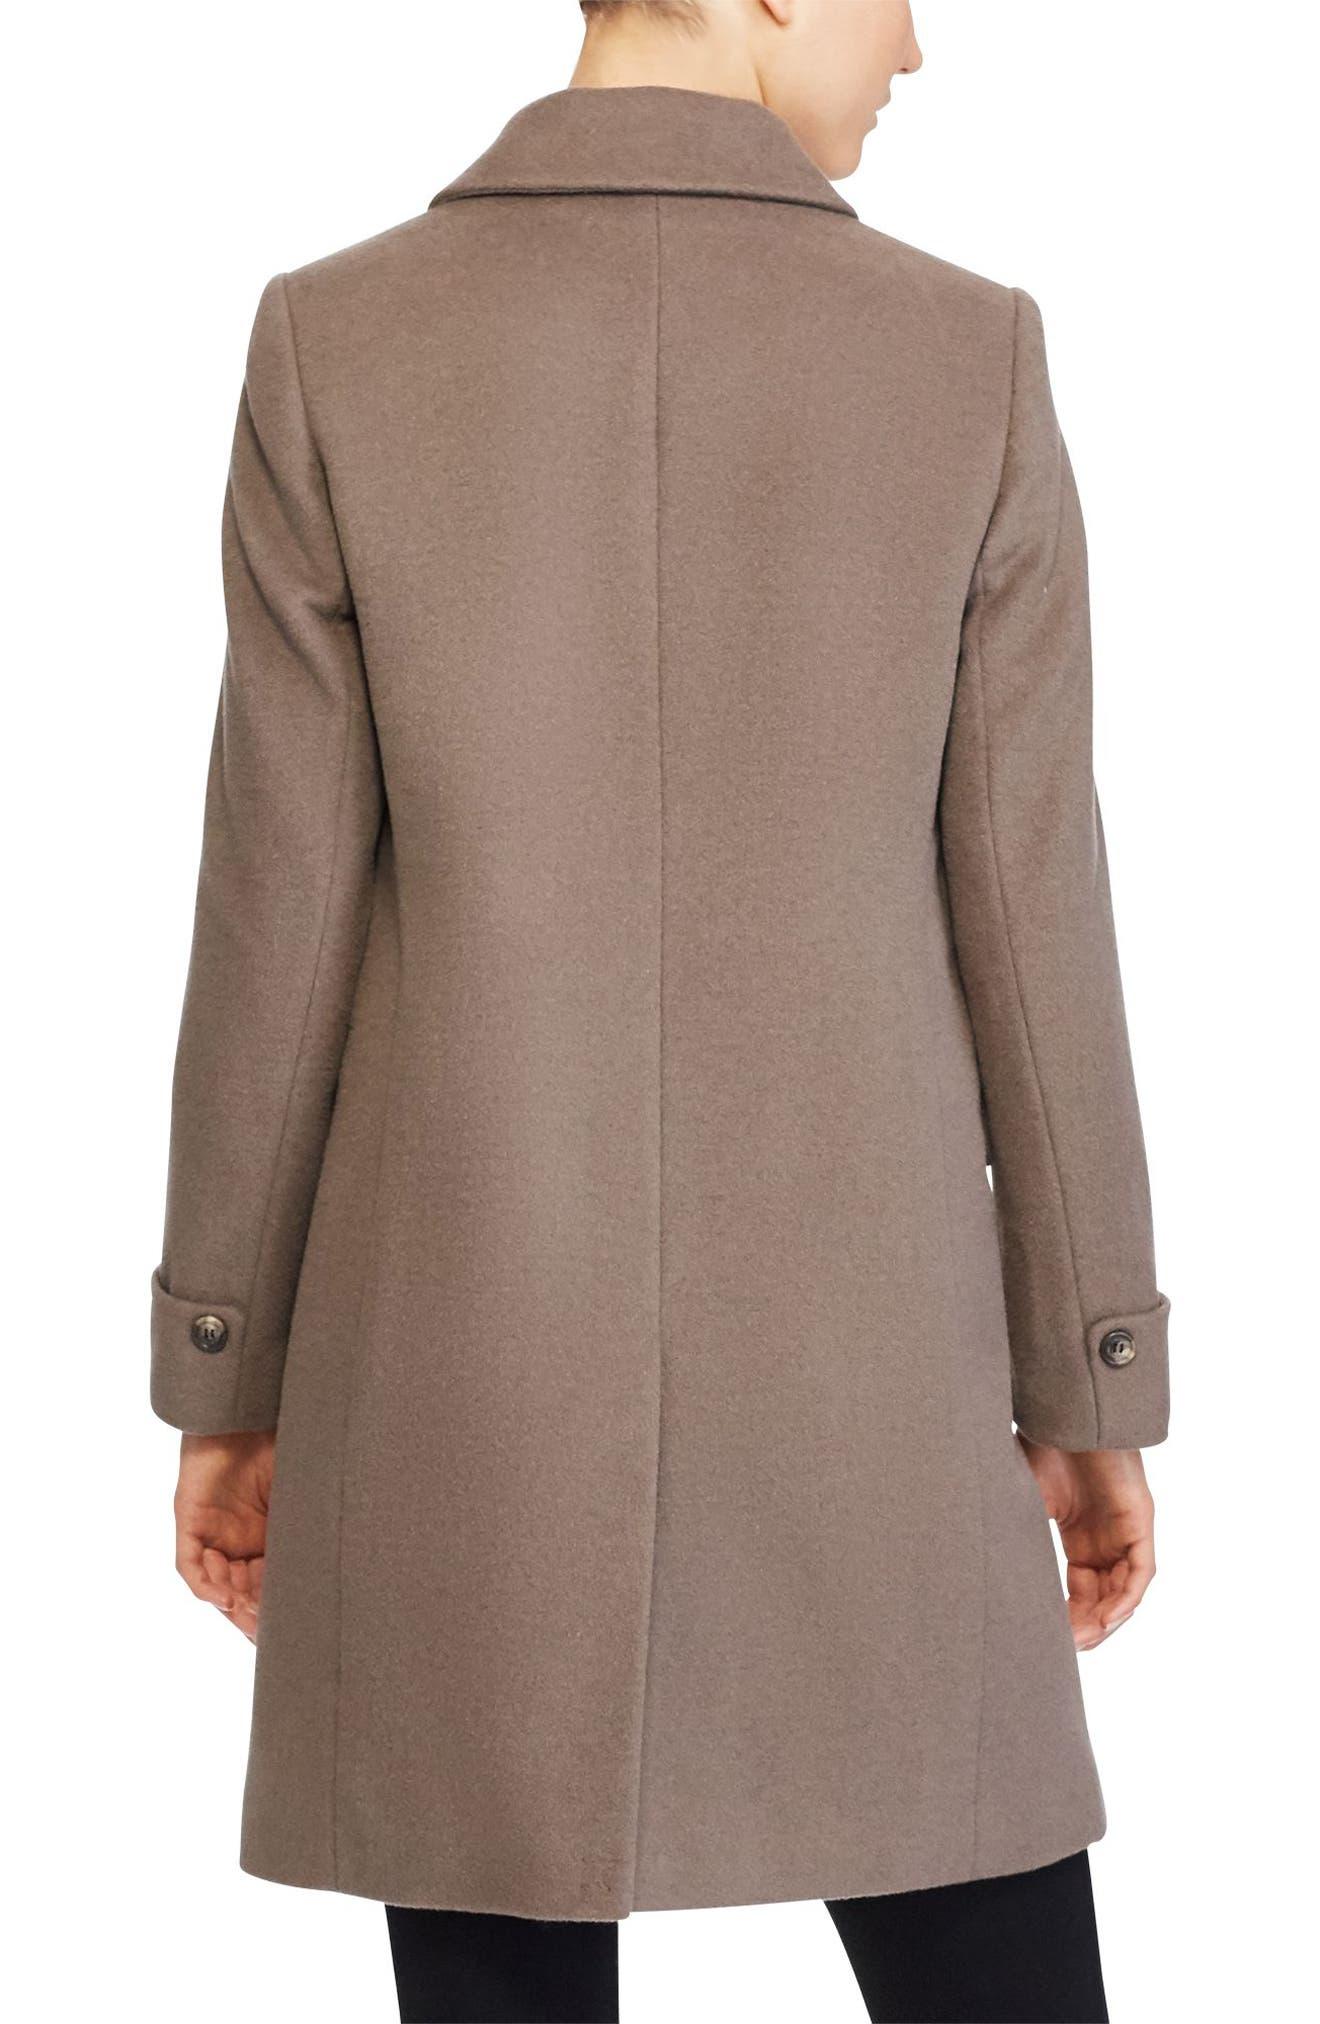 Wool Blend Coat,                             Alternate thumbnail 3, color,                             Mink